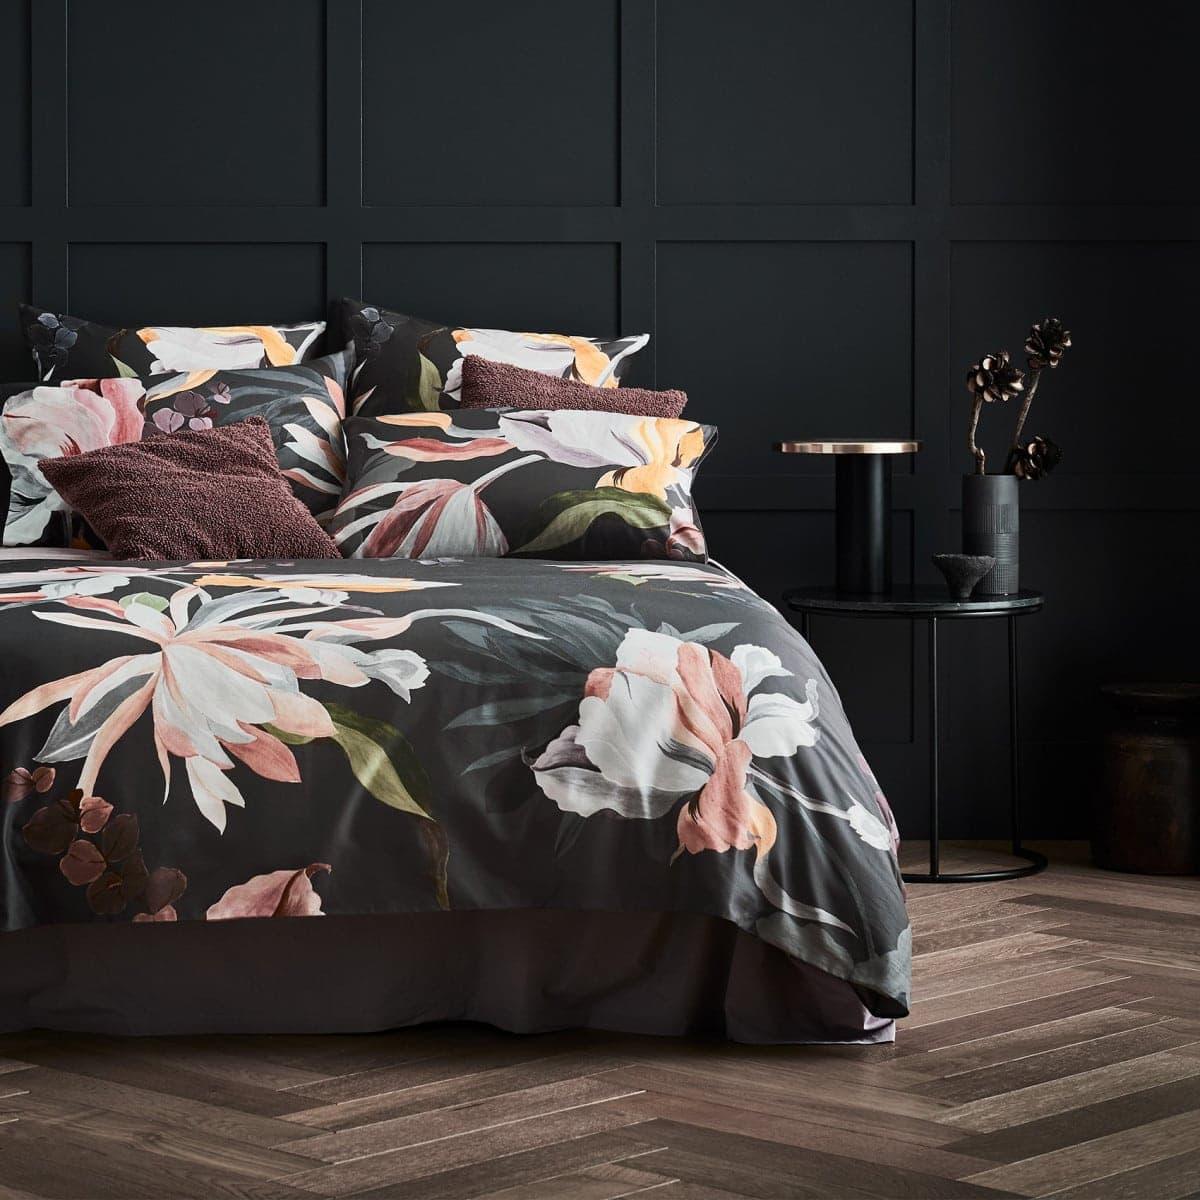 sheridan everly floral quilt cover set dark floral bedding